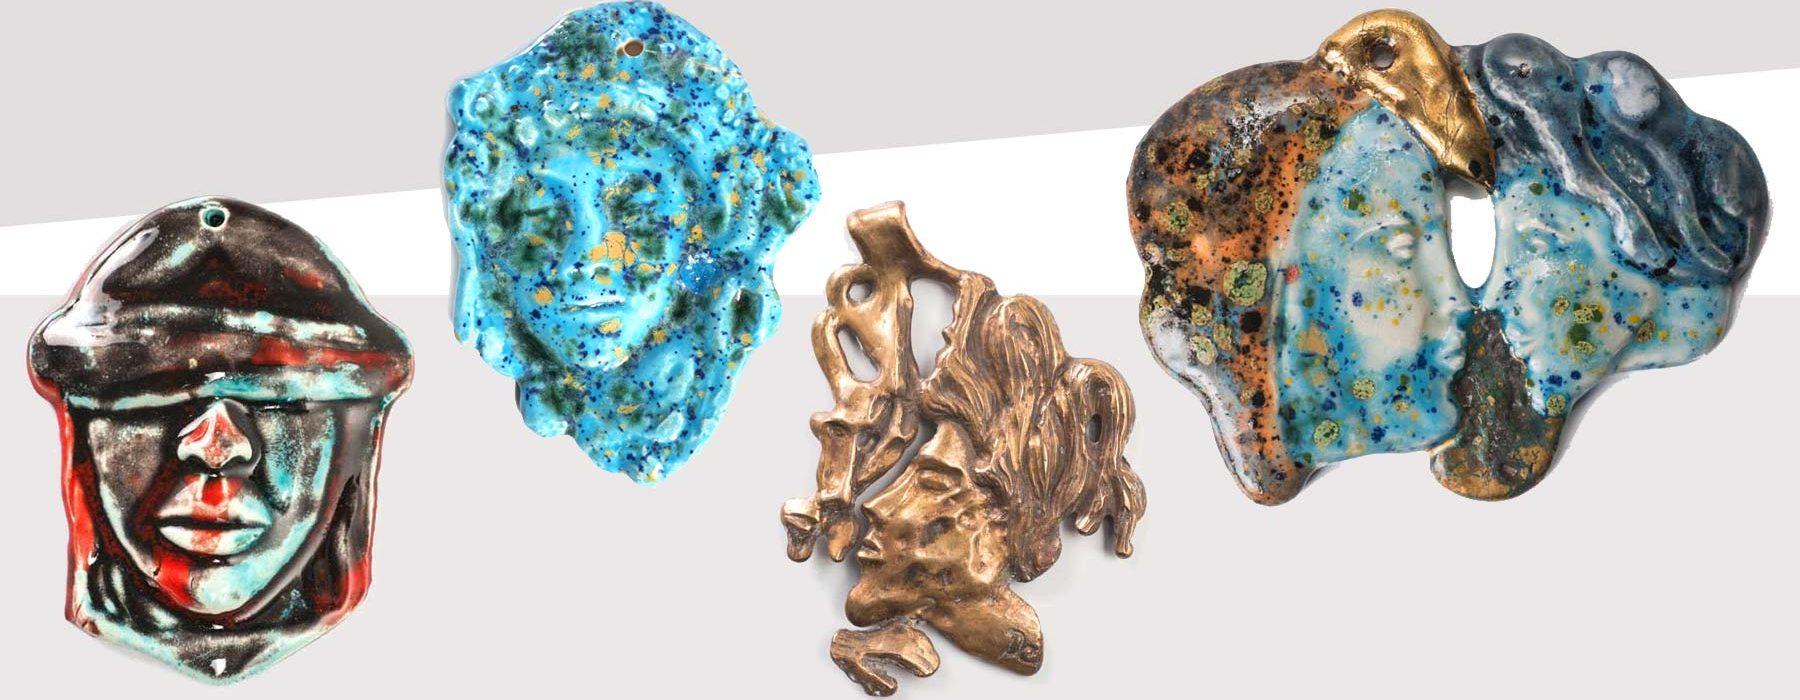 Jewel-sculptures. The art of uniqueness